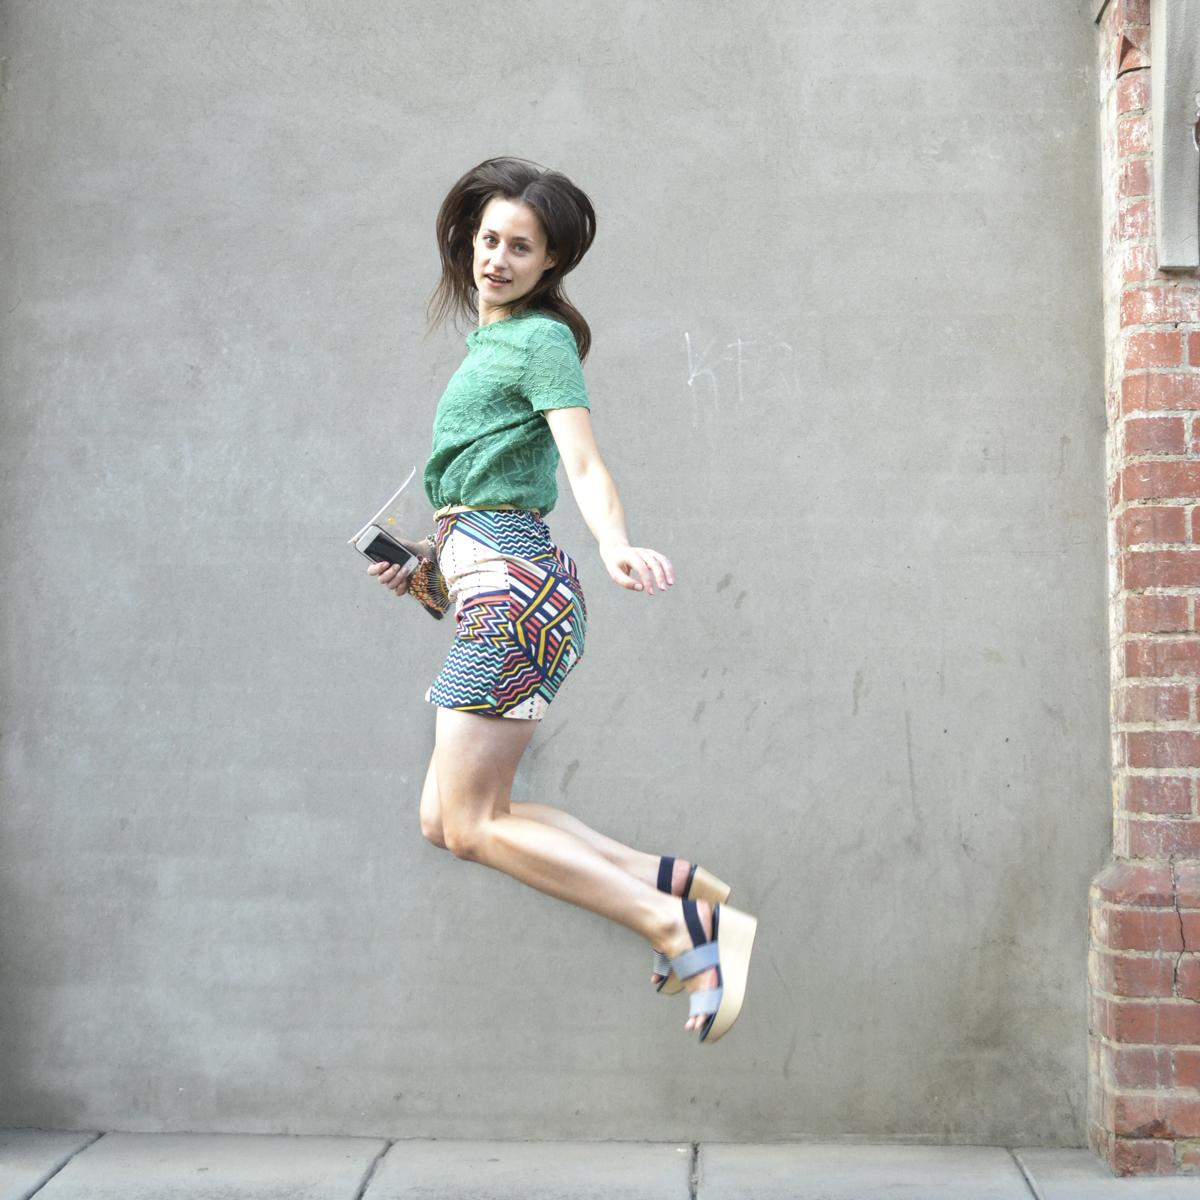 Alexsia-Heller-Profile-Photo.jpg